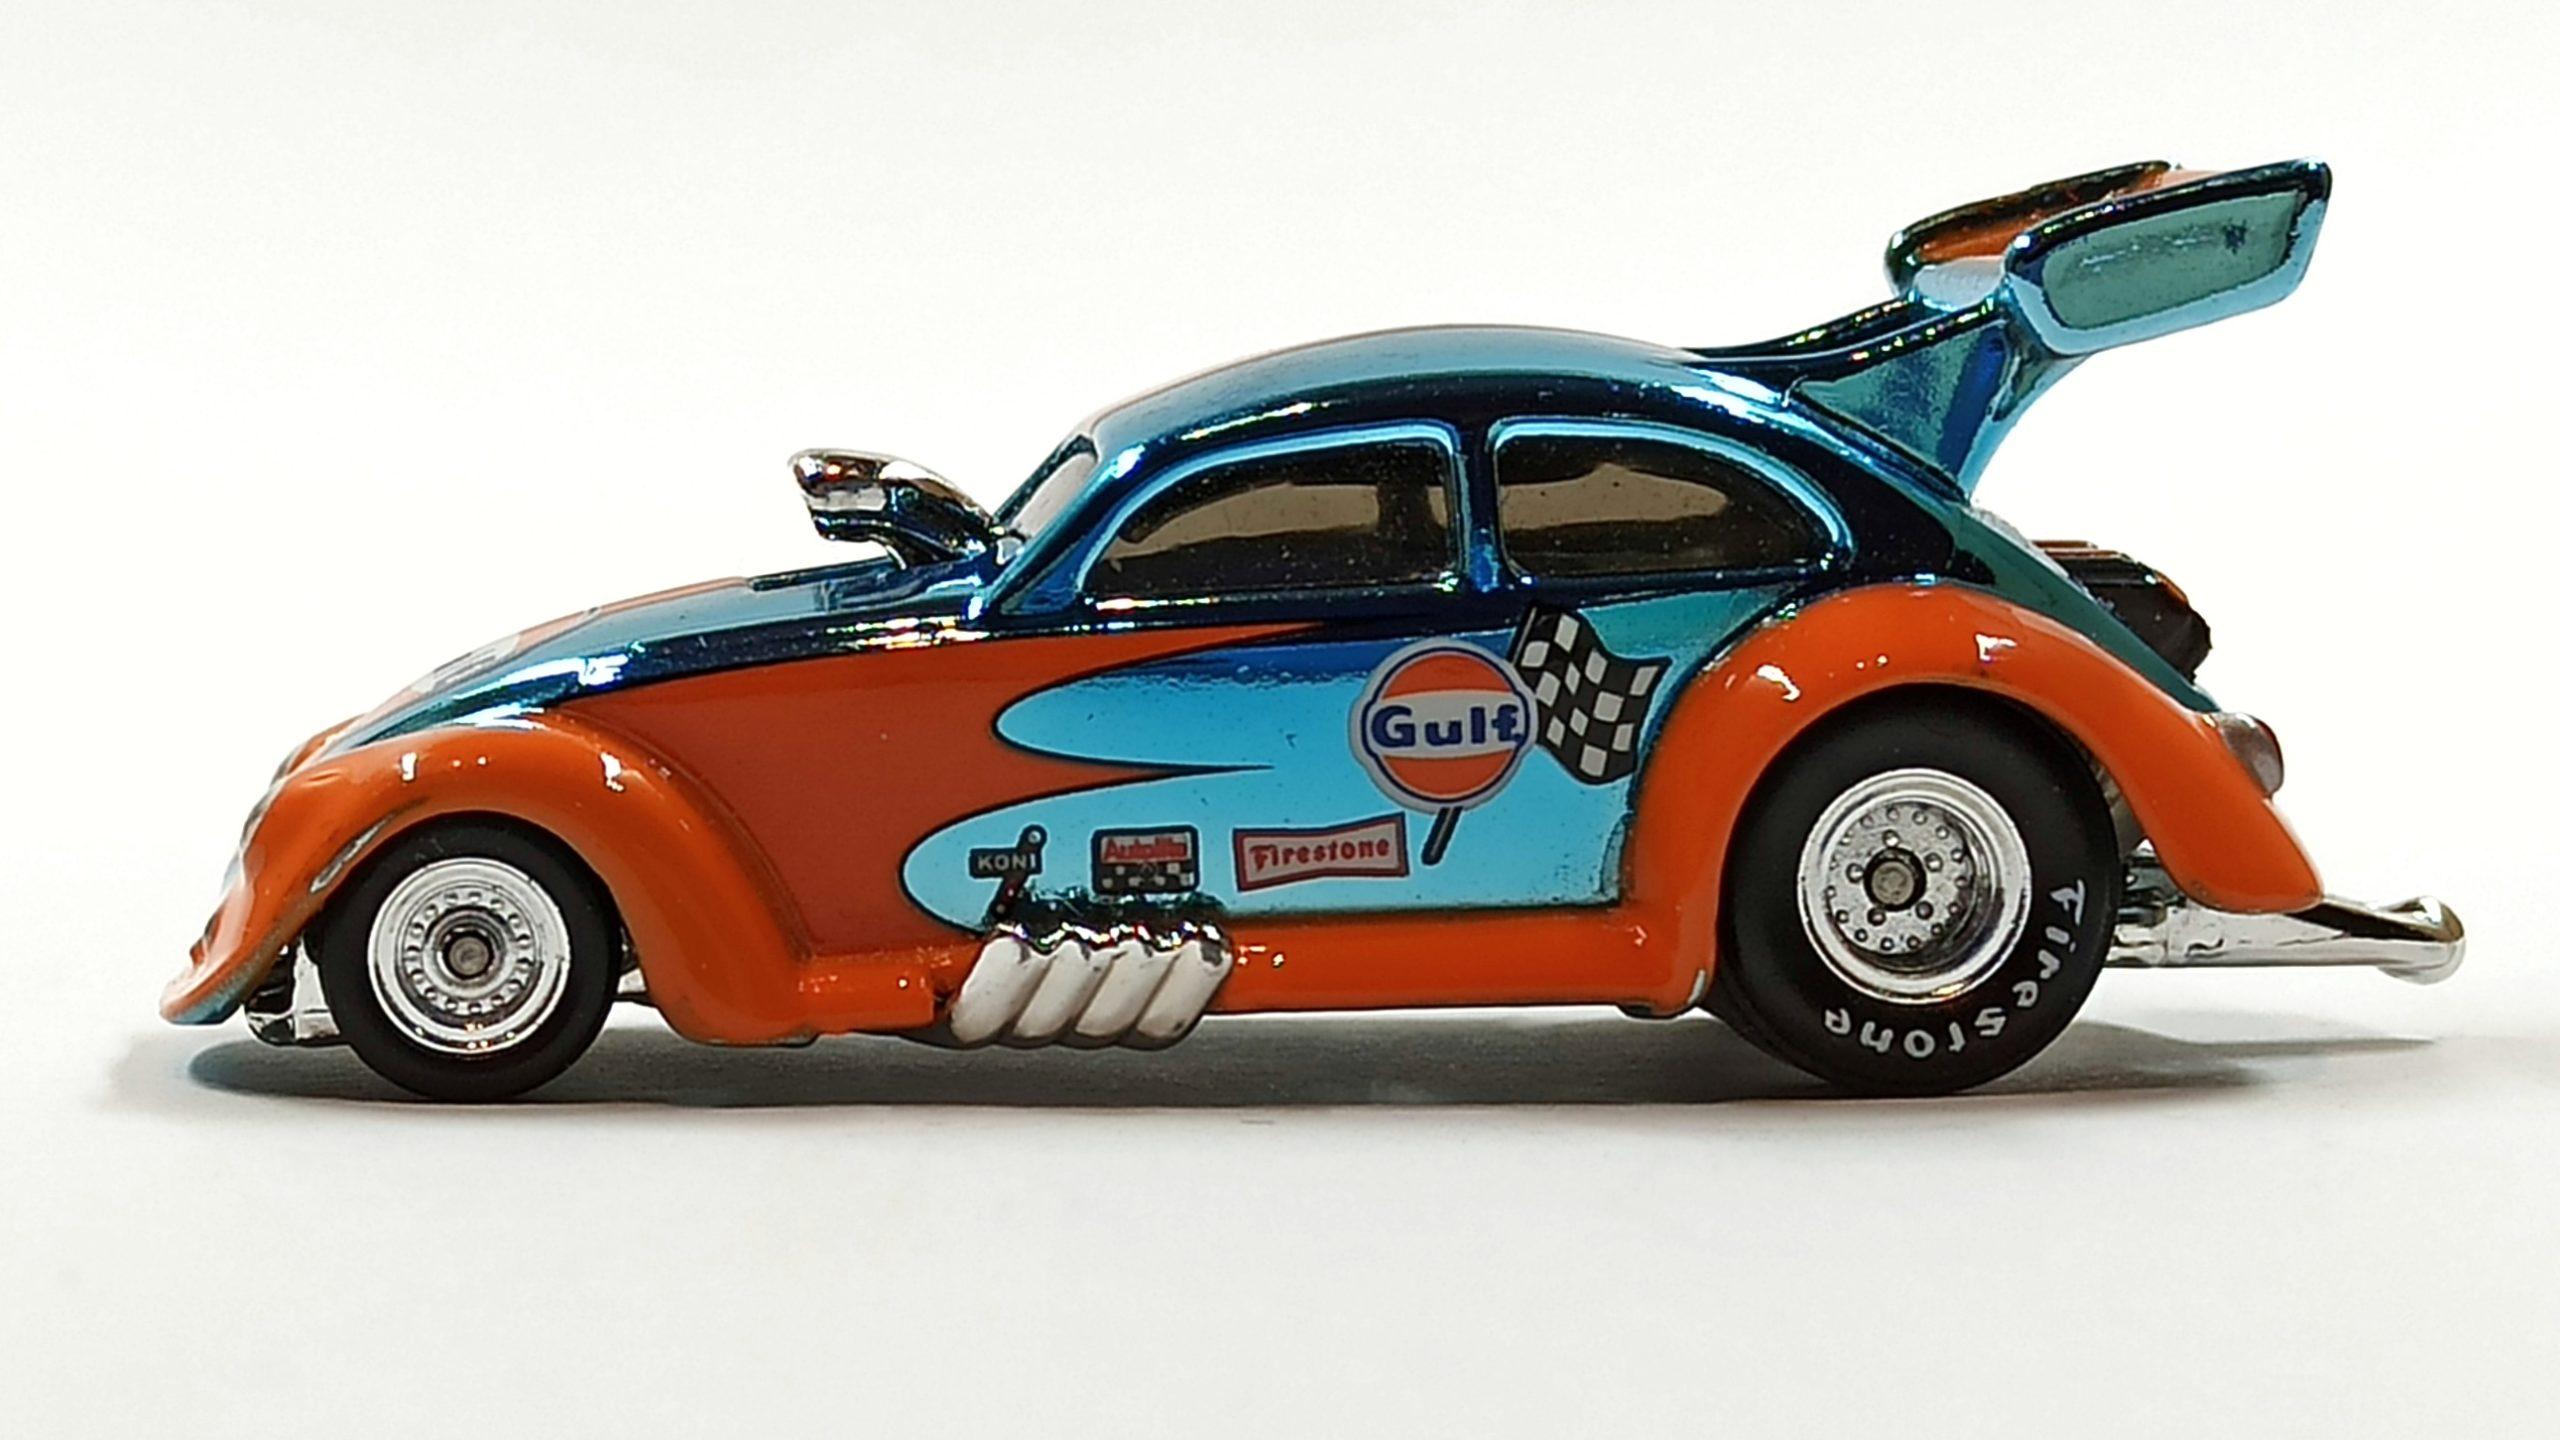 Hot Wheels Custom '56 Volkswagen Drag Beetle (Y0452) 2013 HWC Gulf Racing (3/4) (1 of 4.000) spectraflame light blue (Gulf) side